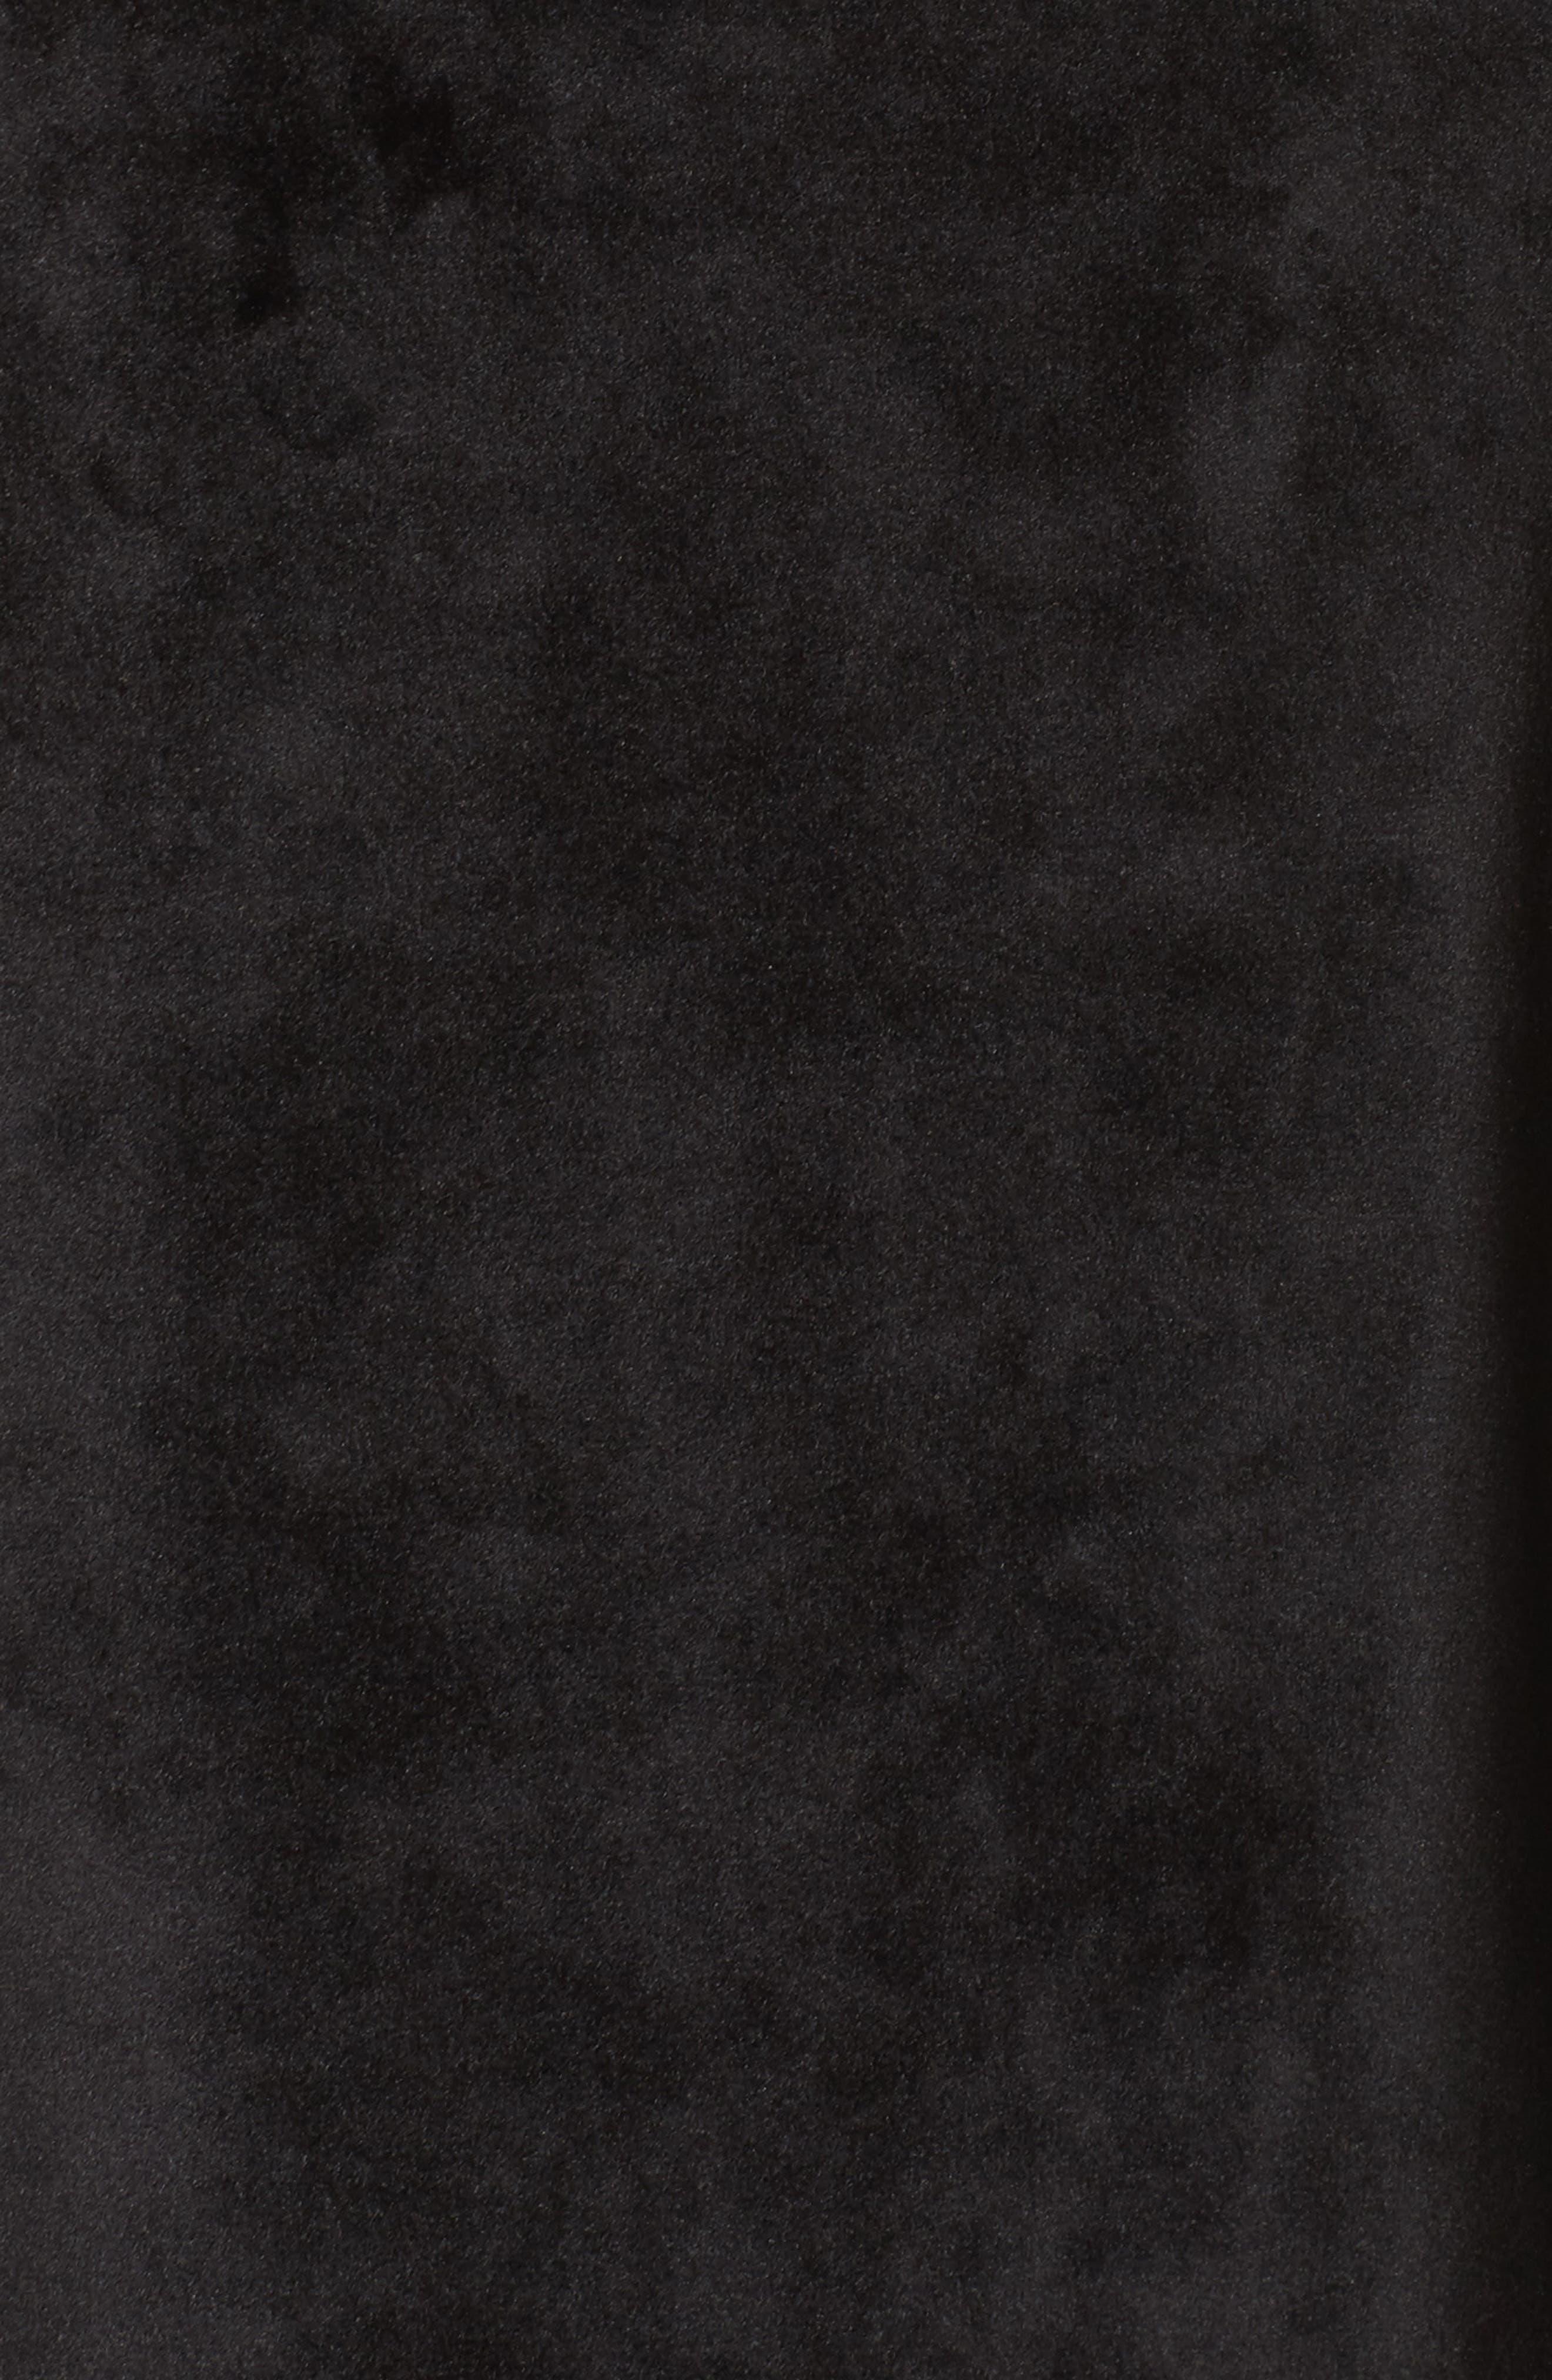 Luxury Plush Sweatshirt,                             Alternate thumbnail 5, color,                             001